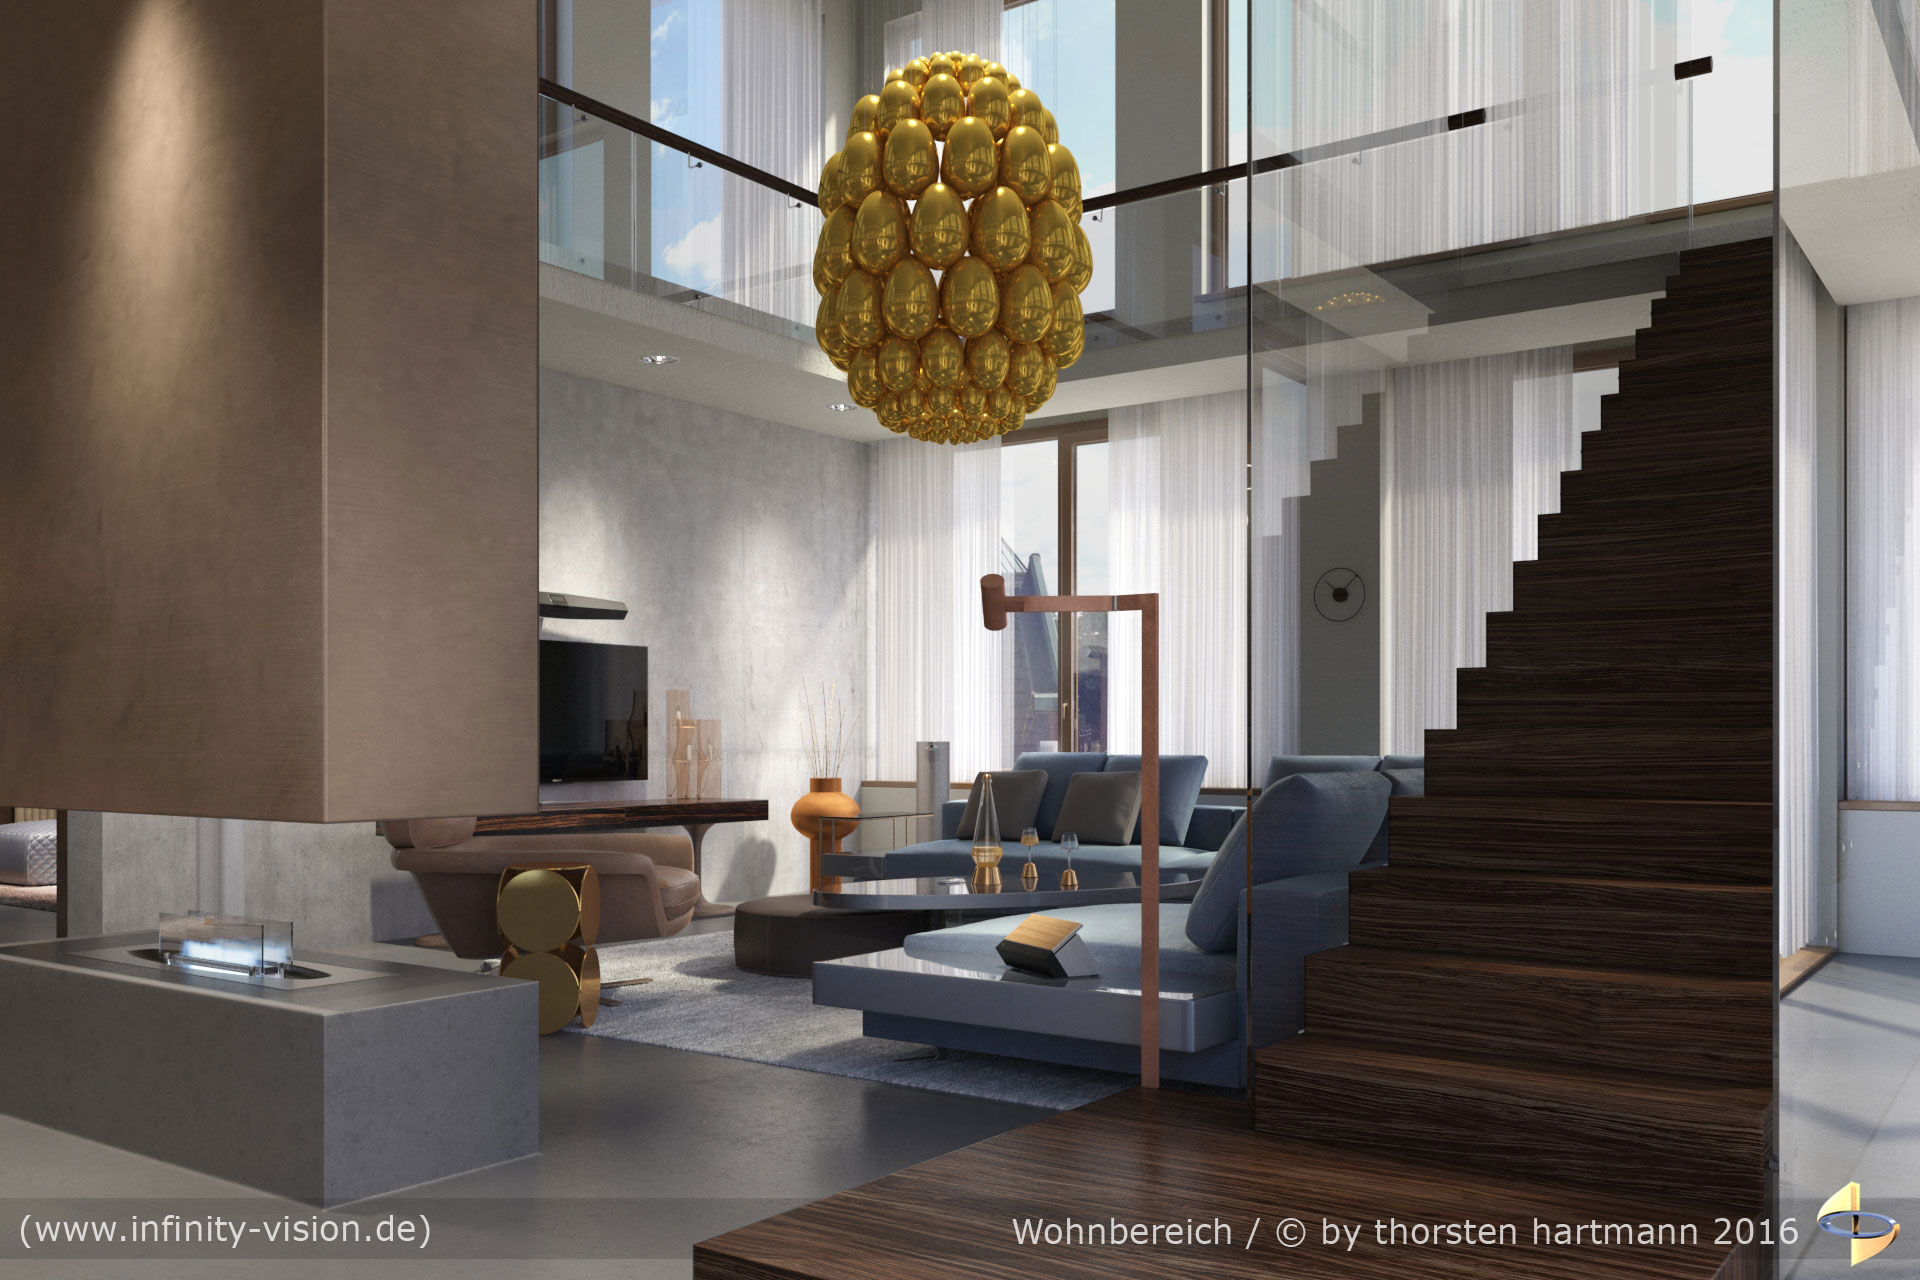 Infinity-Vision   3D Artist & Interior Designer +49 (0) 30 ...